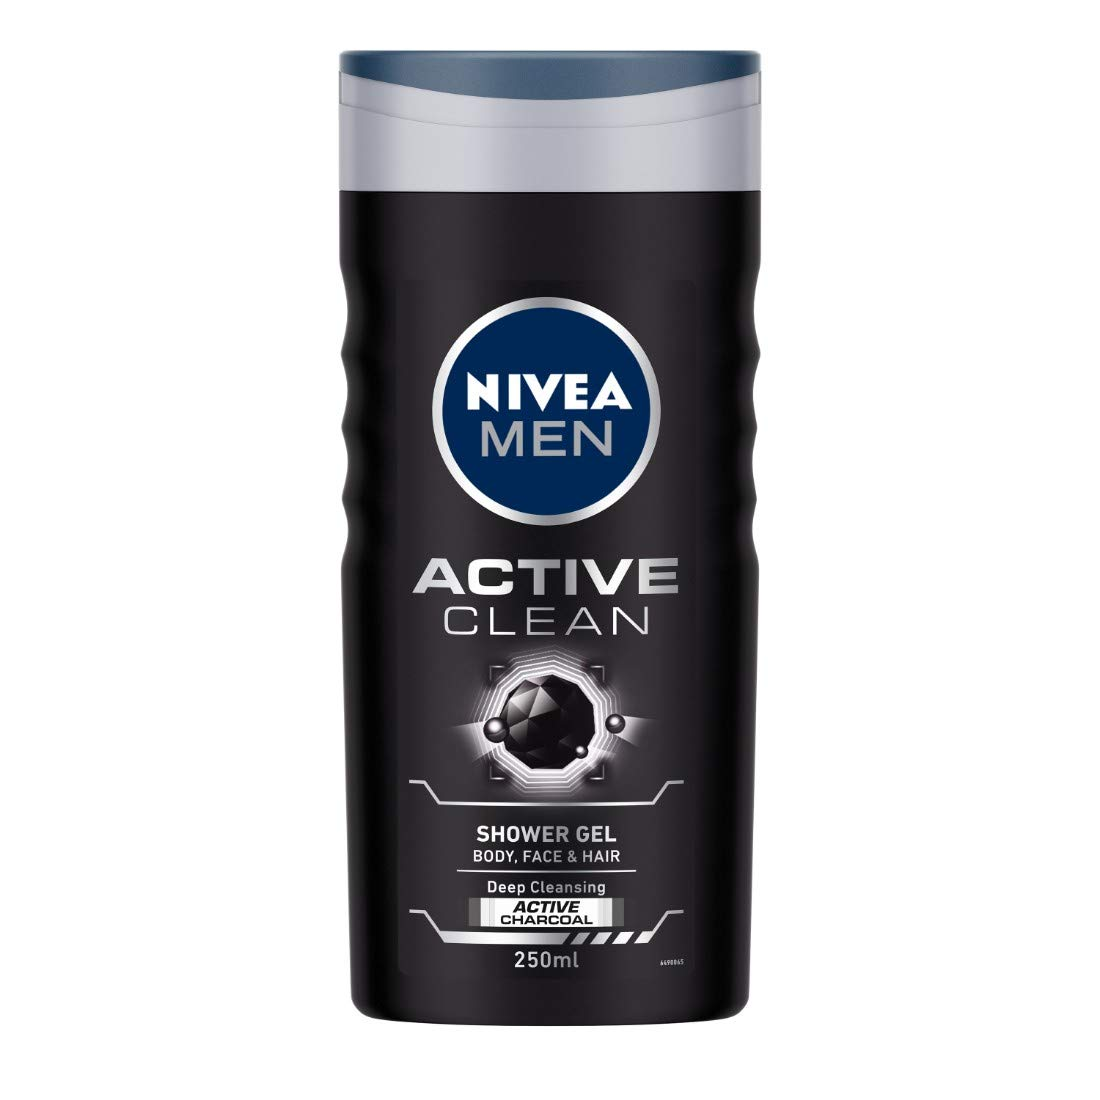 NIVEA MEN Shower Gel, Active Clean Body Wash